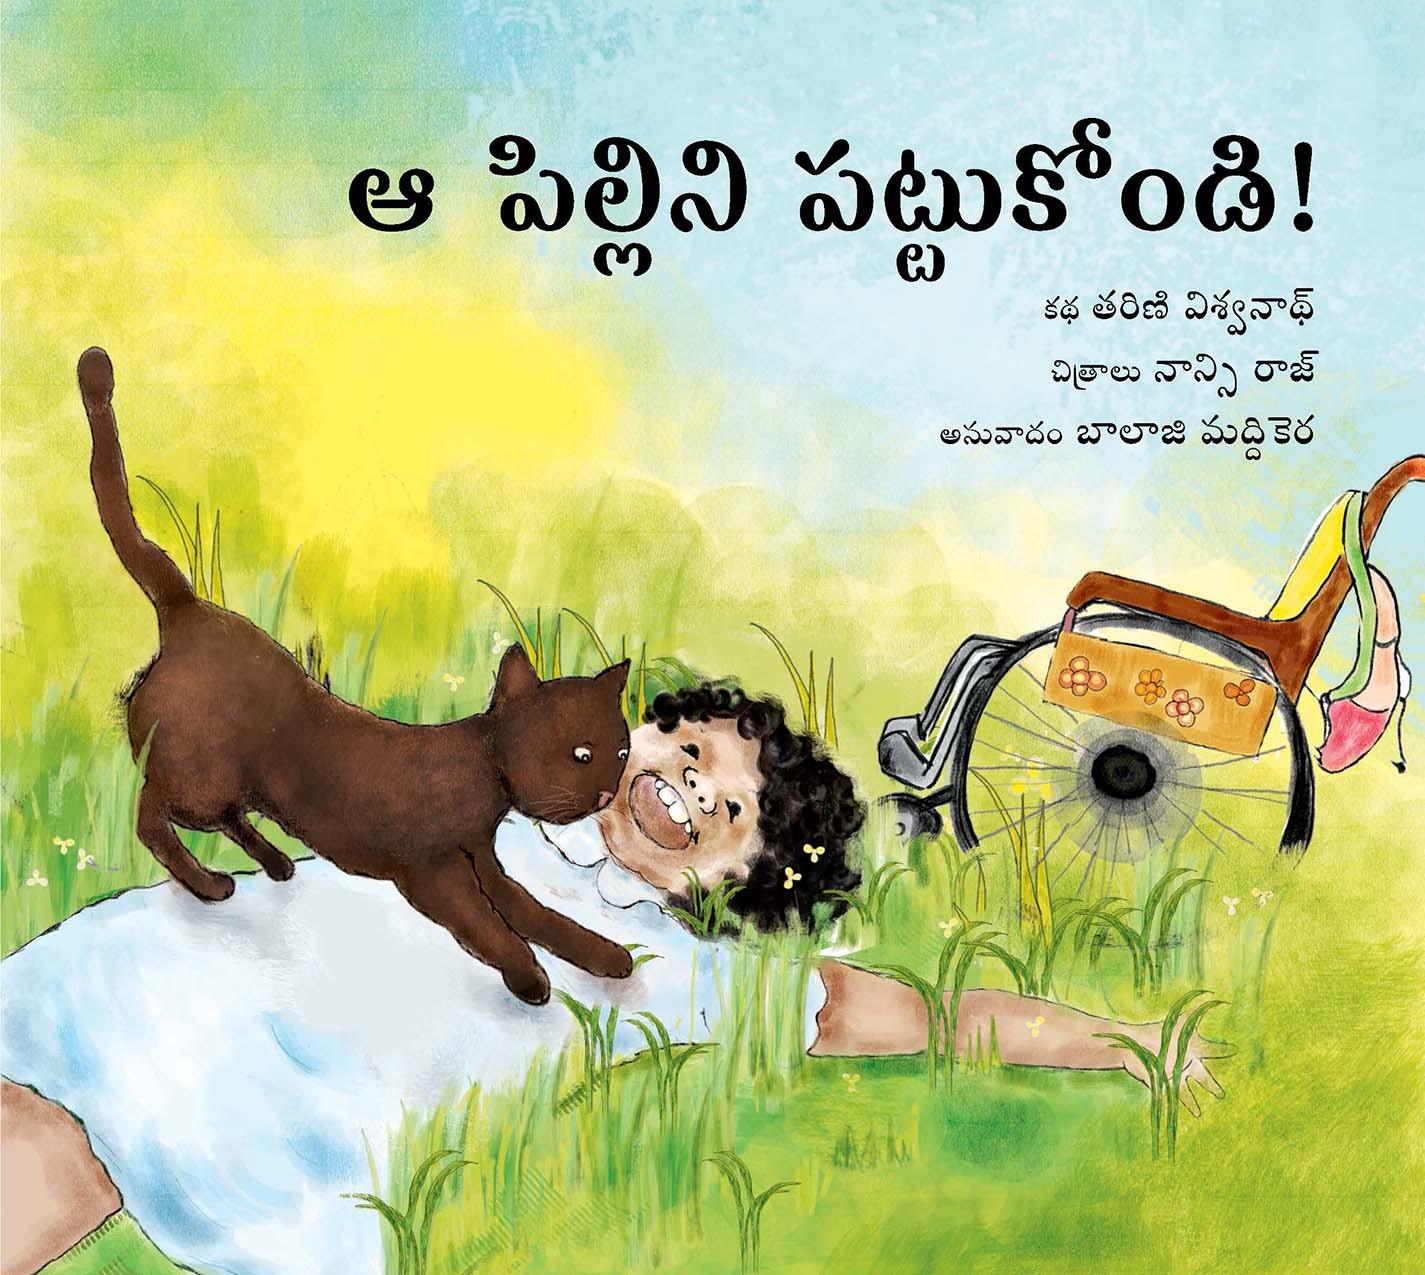 Catch That Cat/Aa Pillini Pattukondi (Telugu)